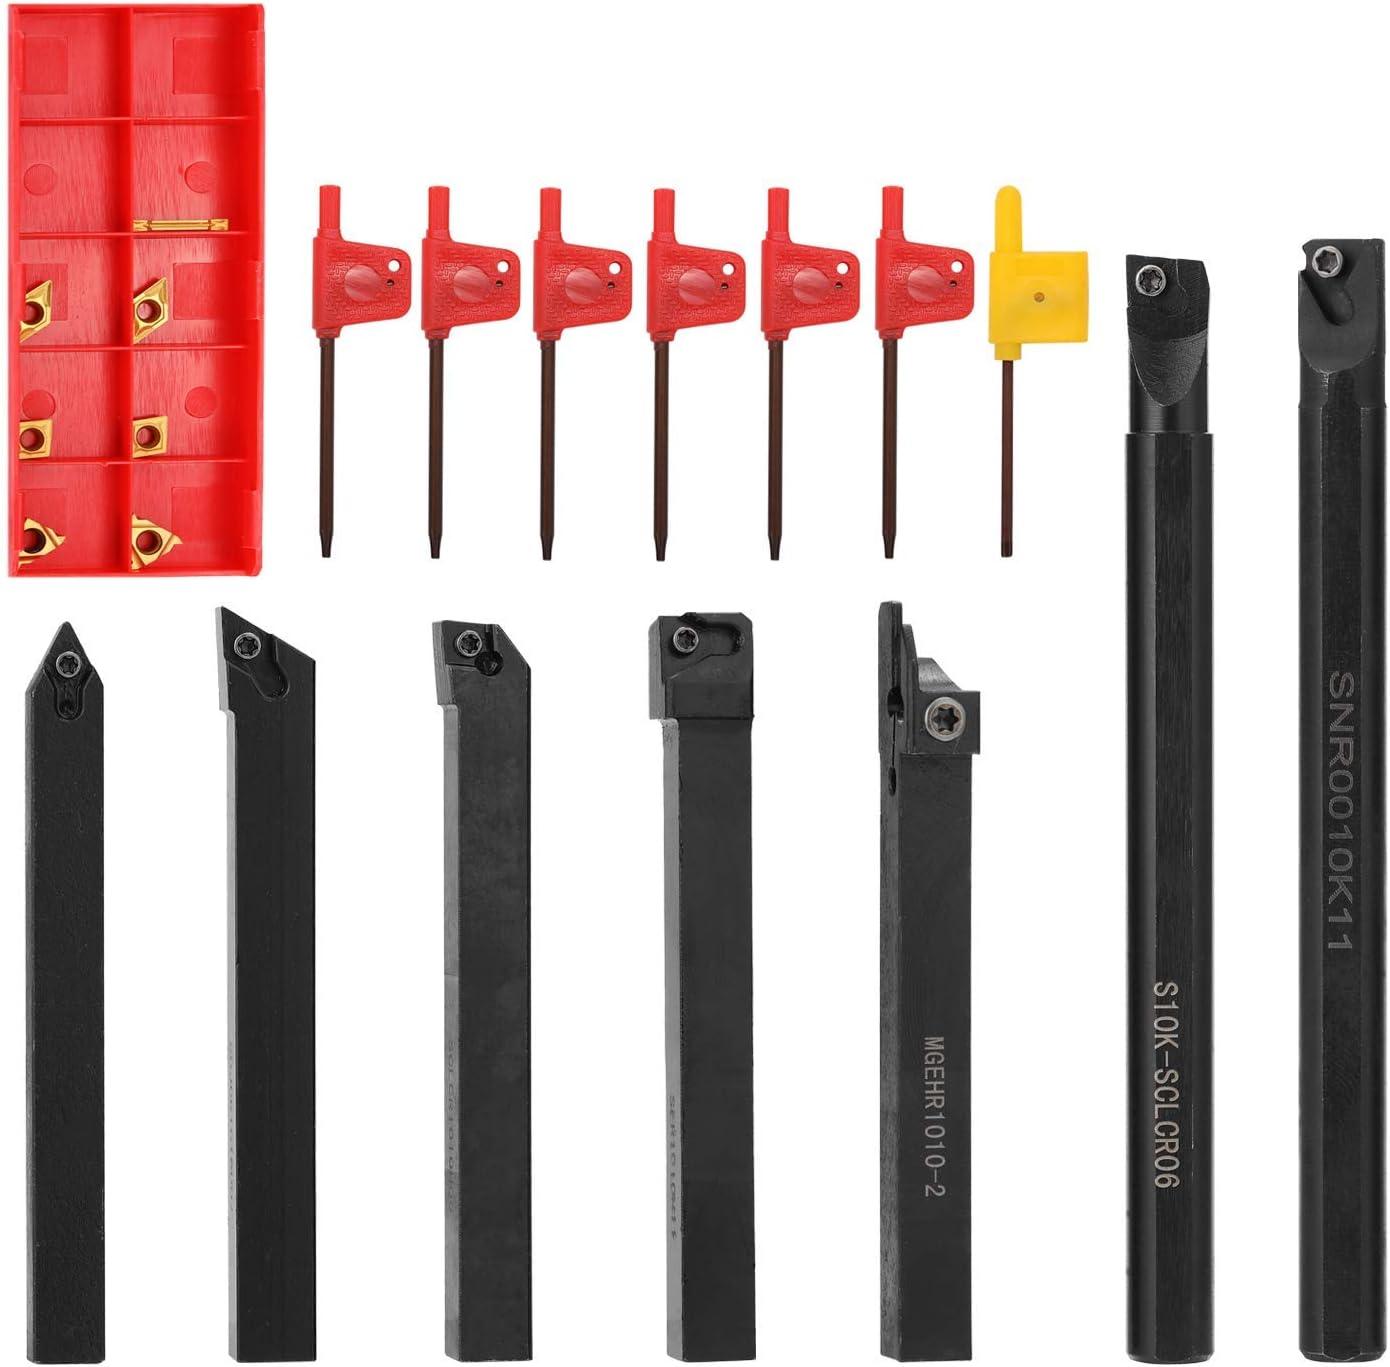 KKmoon 7pcs 10mm Schaftdrehmaschine Drehwerkzeughalter Bohrstange mit Hartmetalleins/ätzen